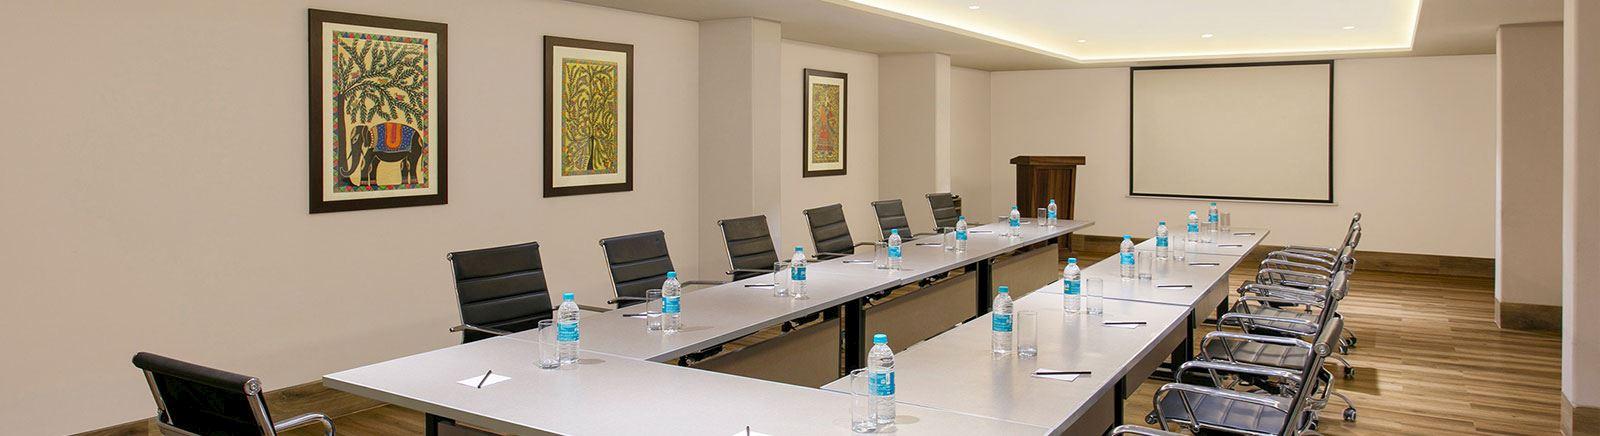 Ginger Patna Services & Facilities